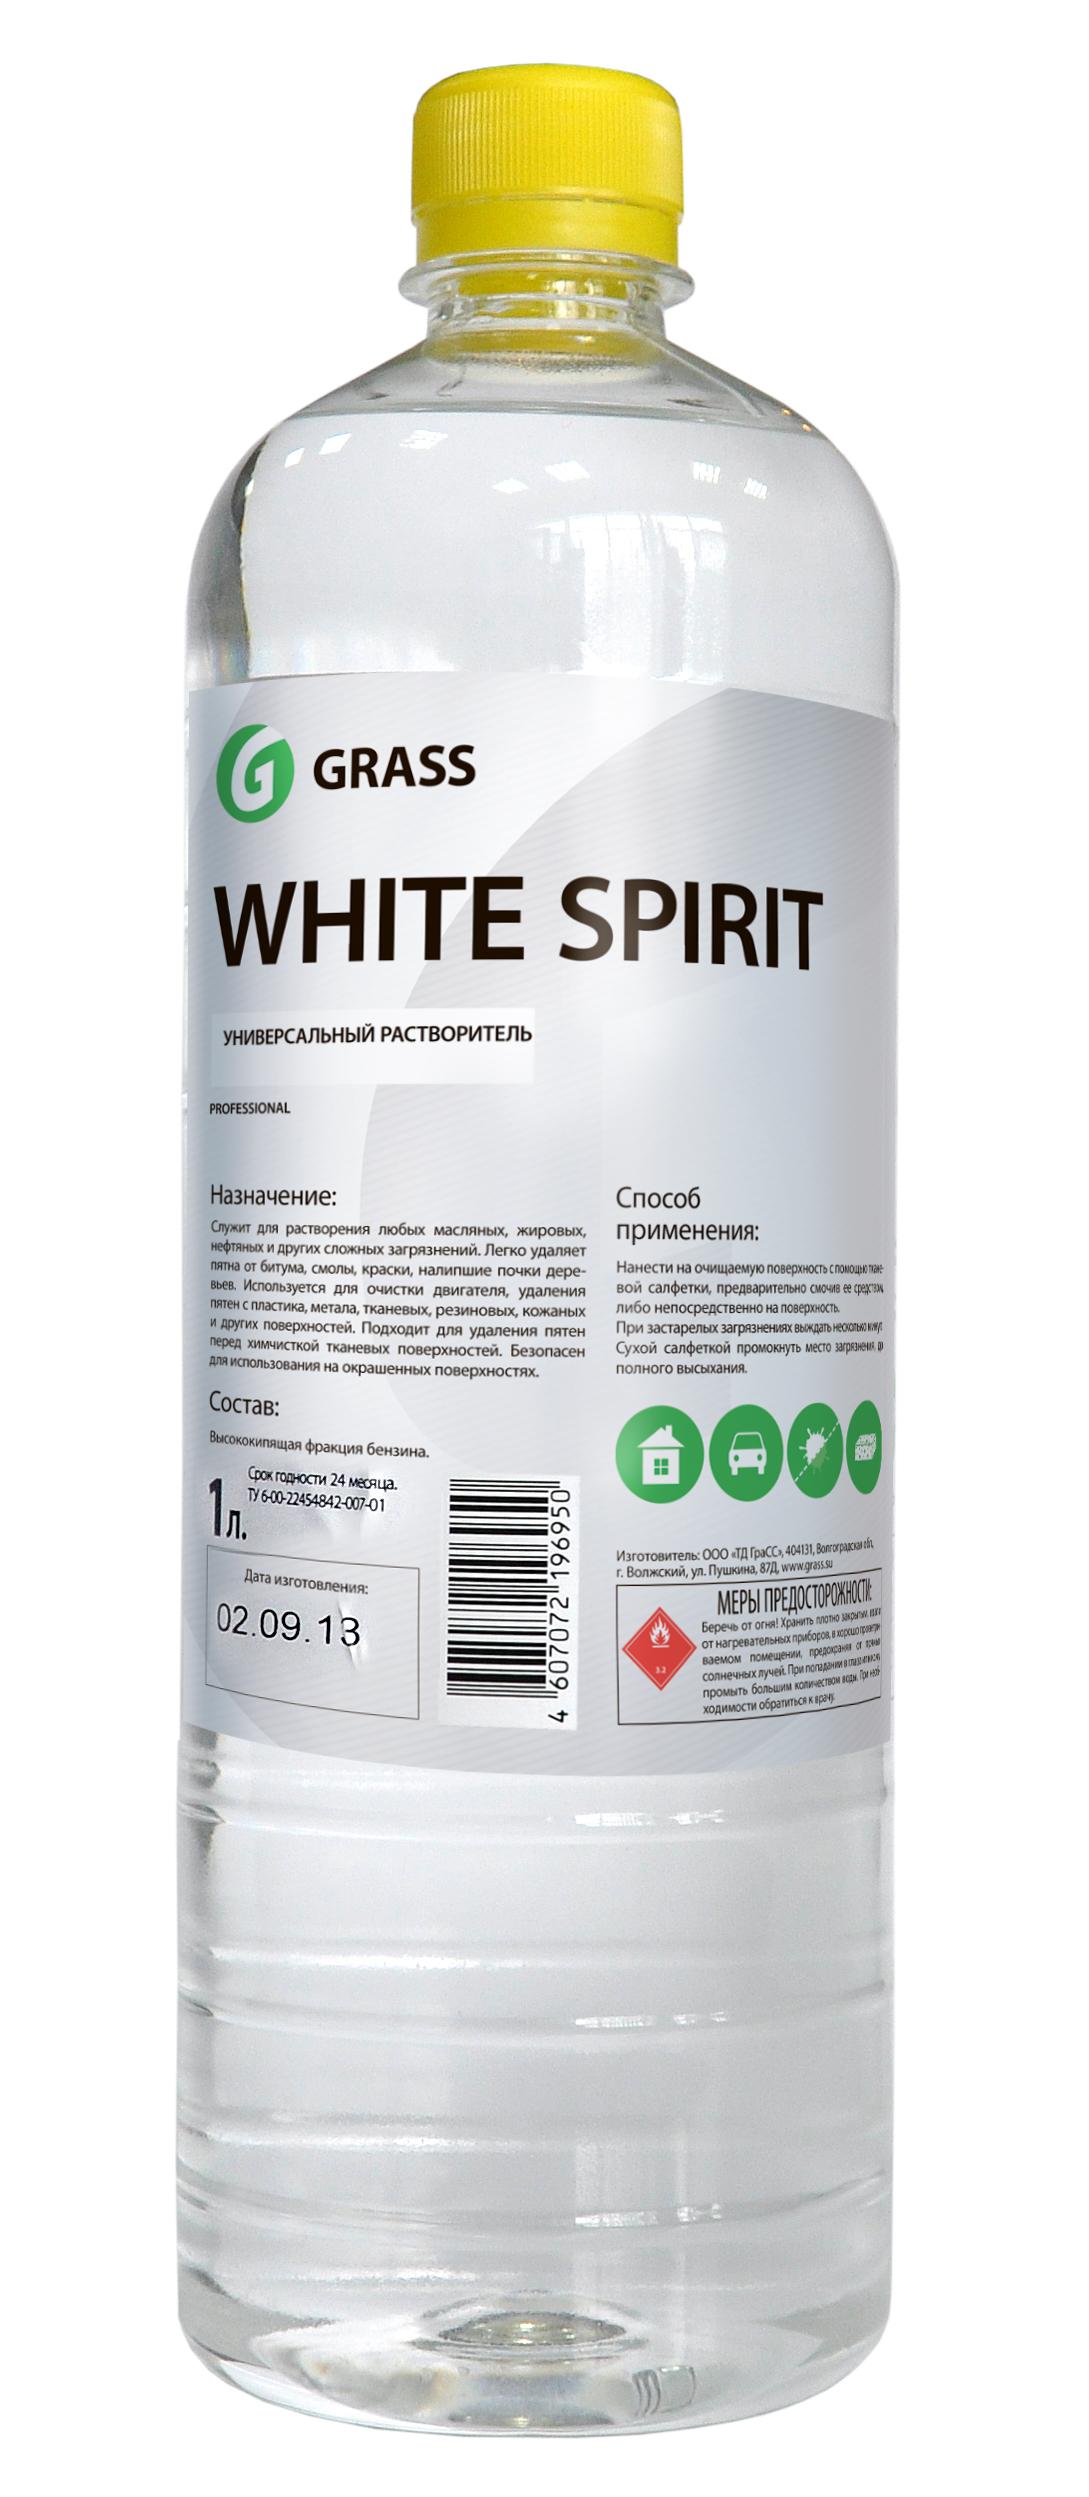 213101 white spirit, Растворитель